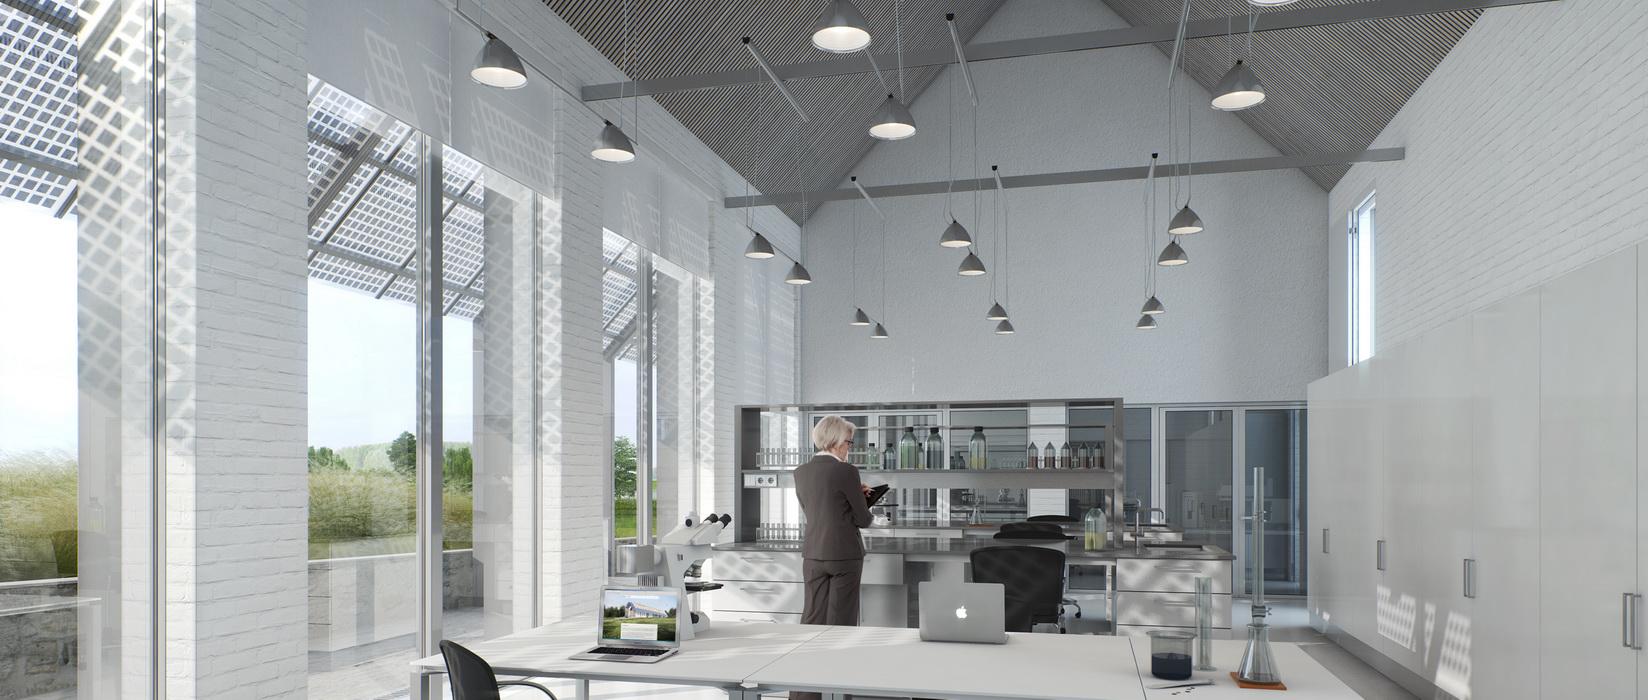 intro-crisan architecture-025